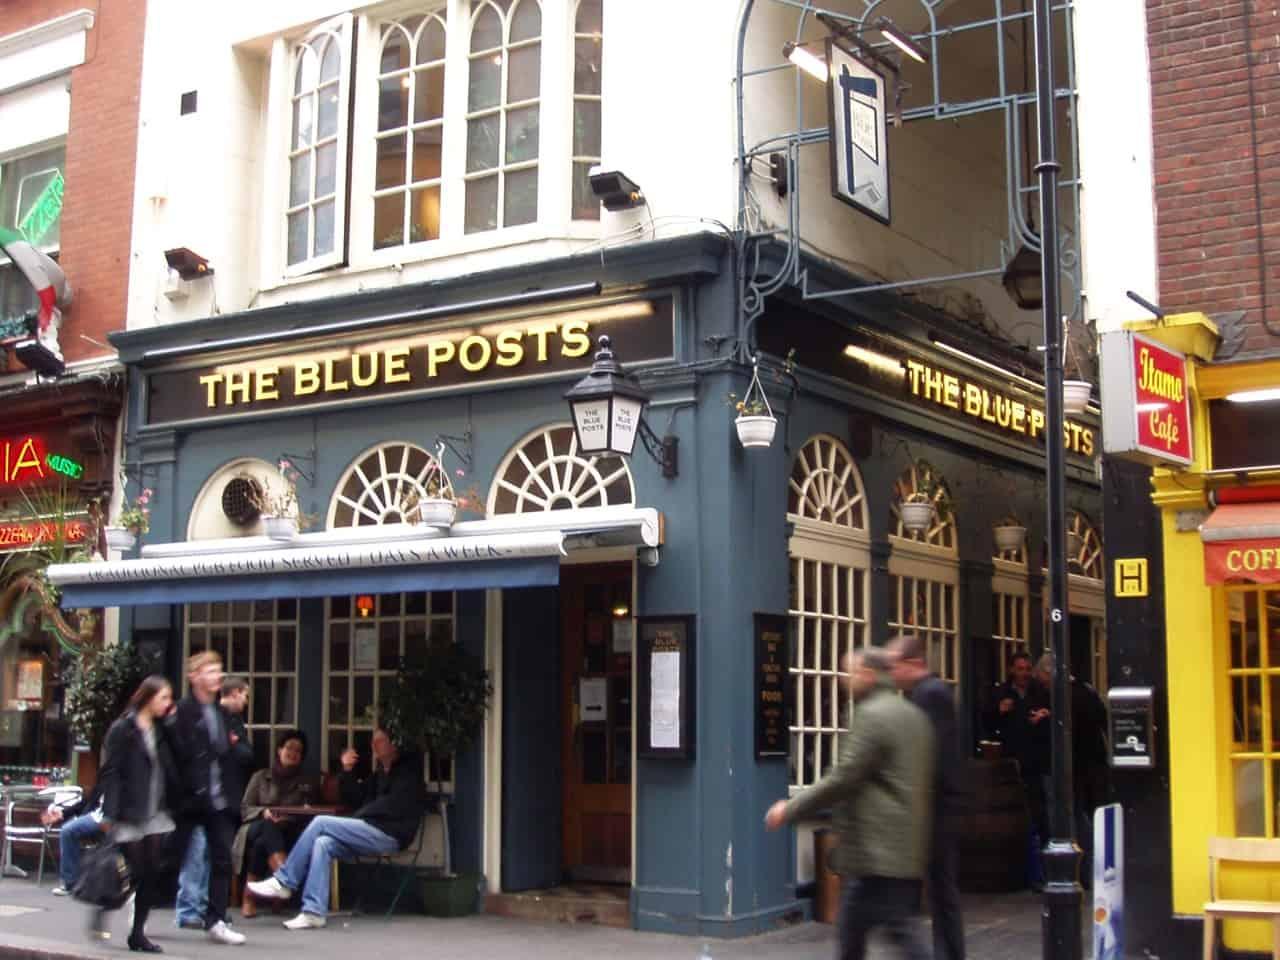 Blue Posts, best pubs in central London | Photo: Ewan Munro / Flickr